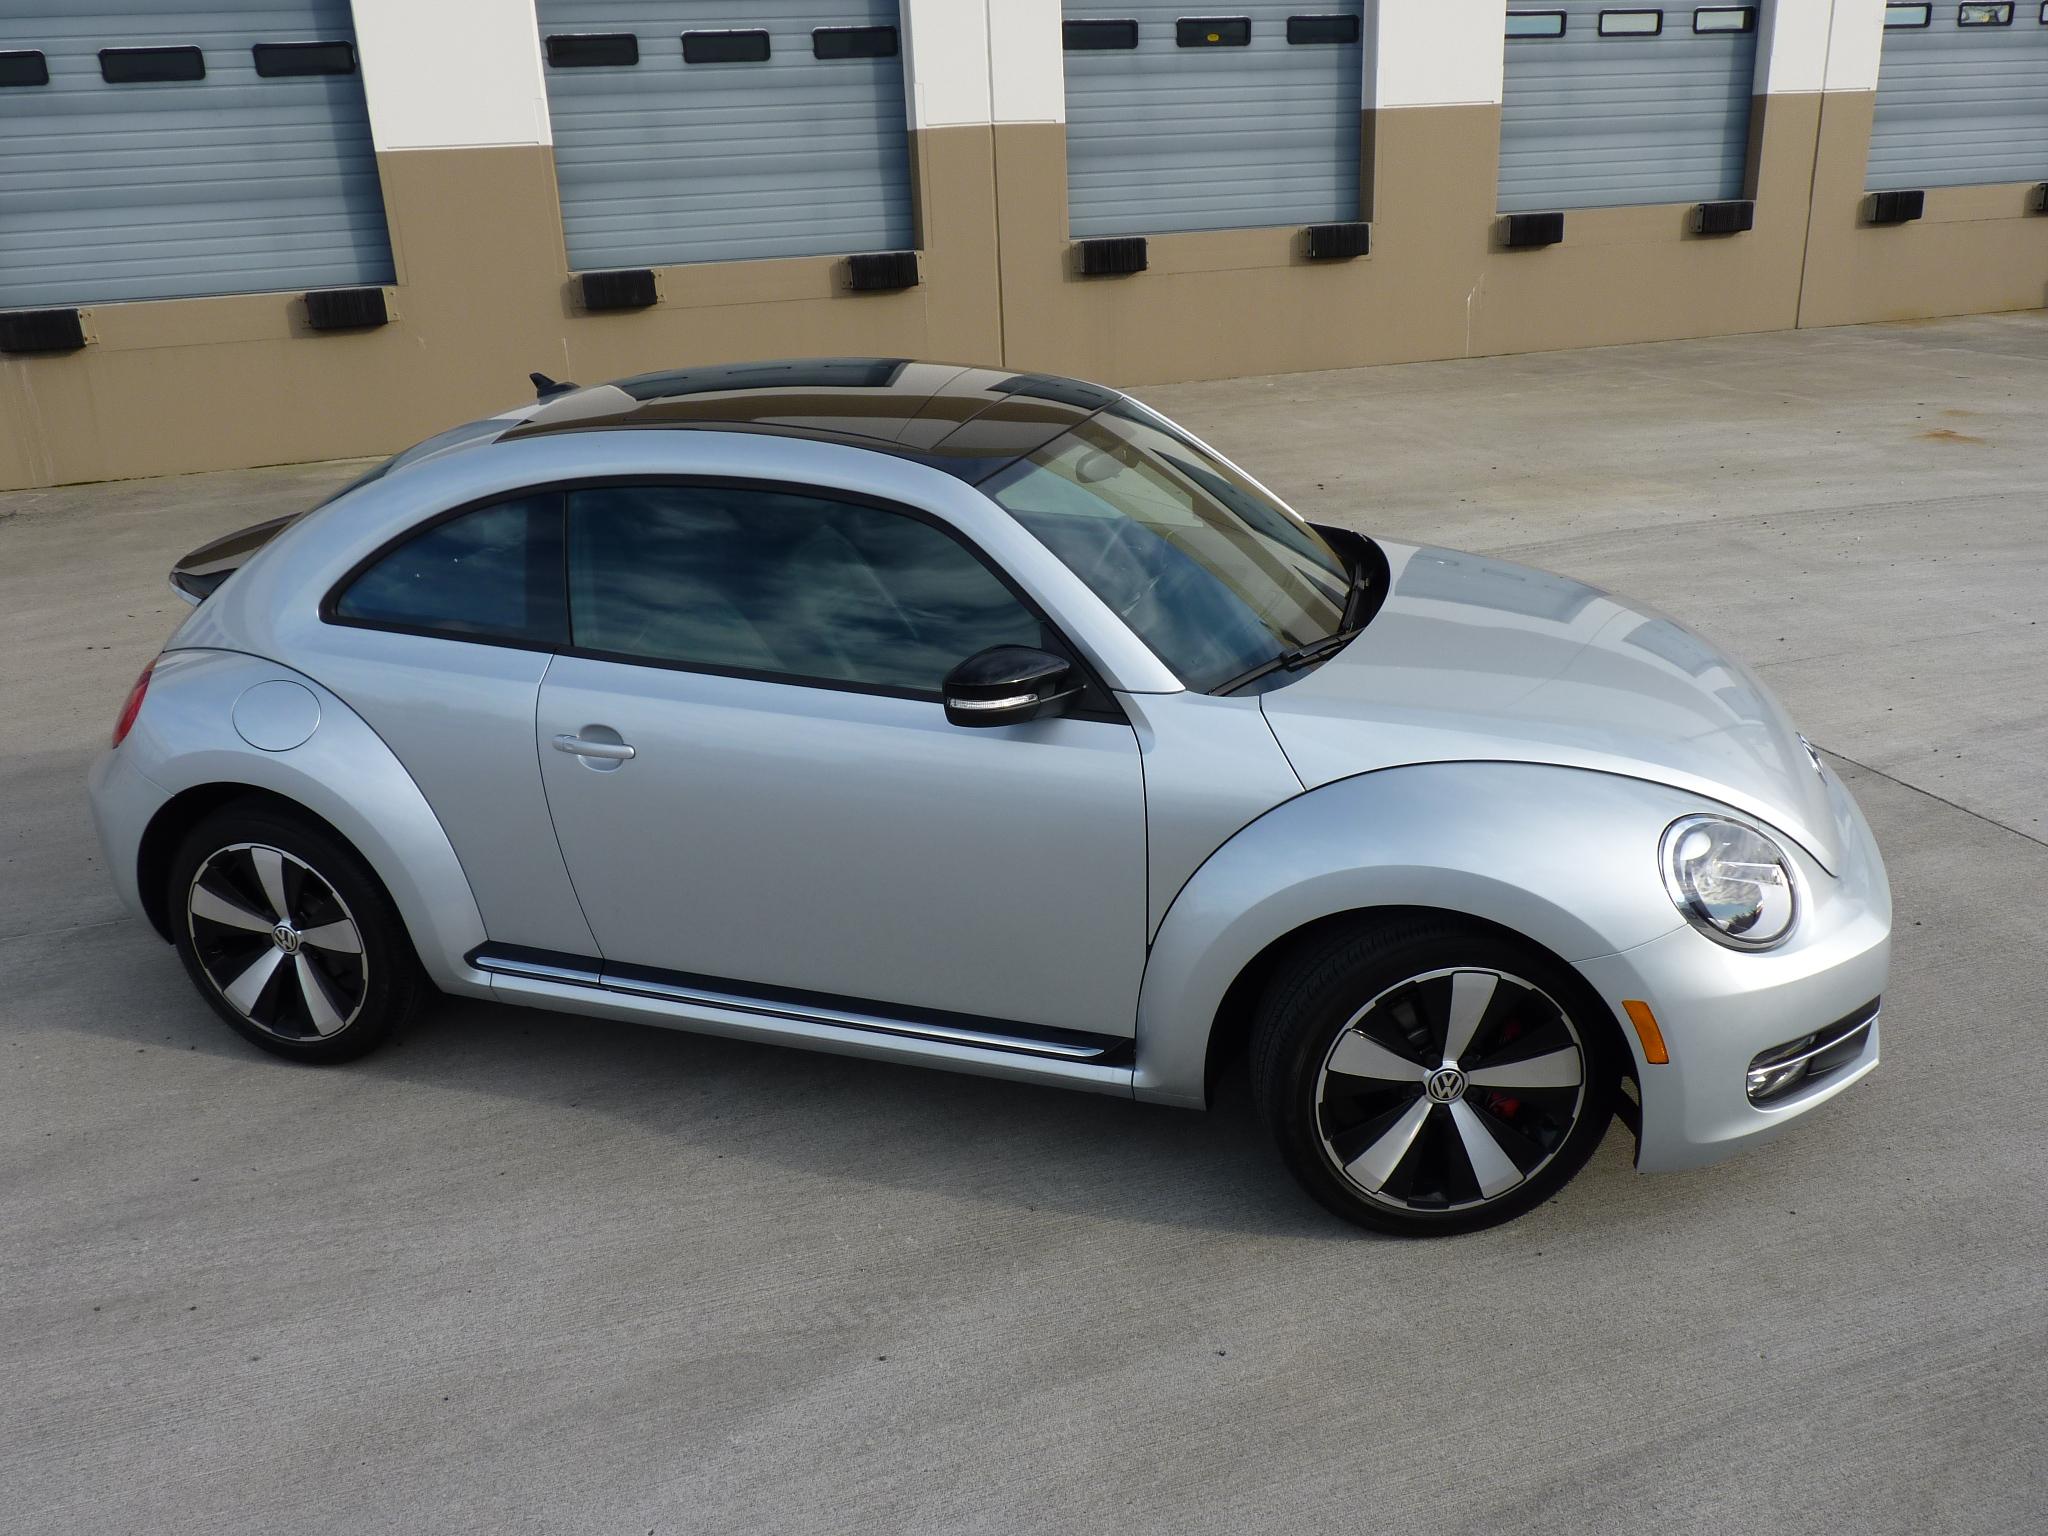 2012 volkswagen beetle turbo driven. Black Bedroom Furniture Sets. Home Design Ideas